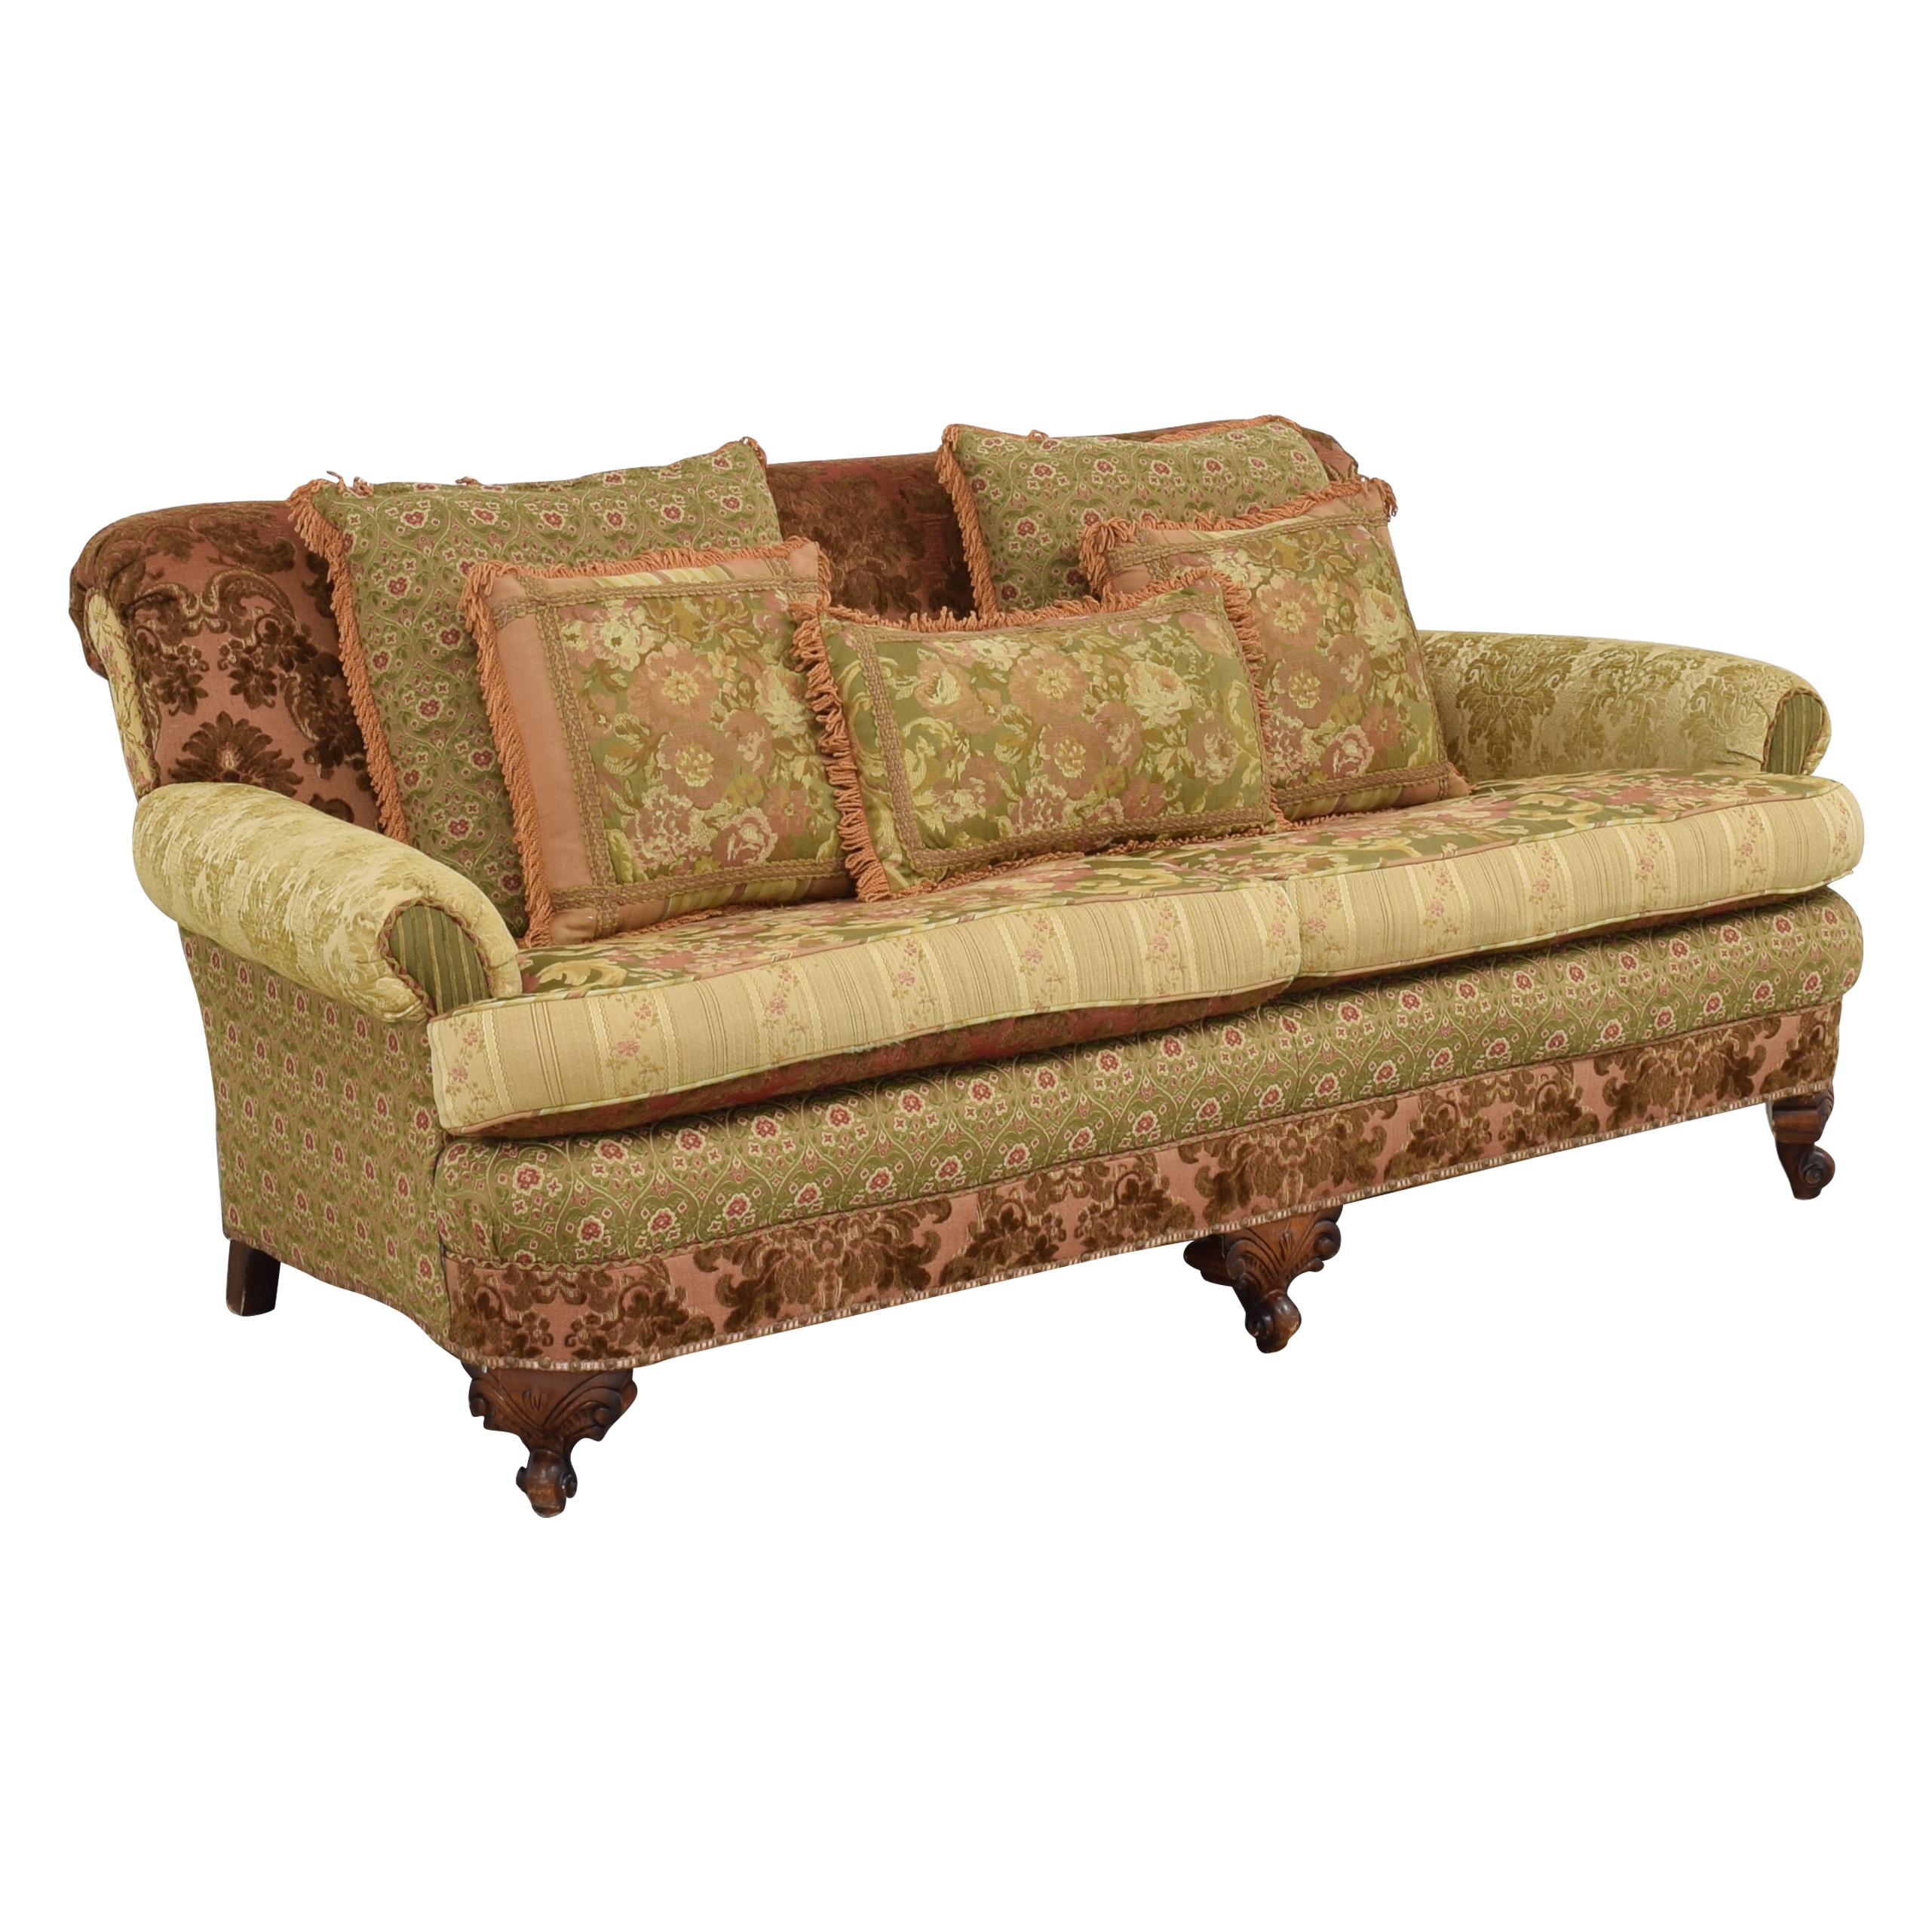 Key City Furniture Key City Jeff Zimmerman Victorian Sofa nj